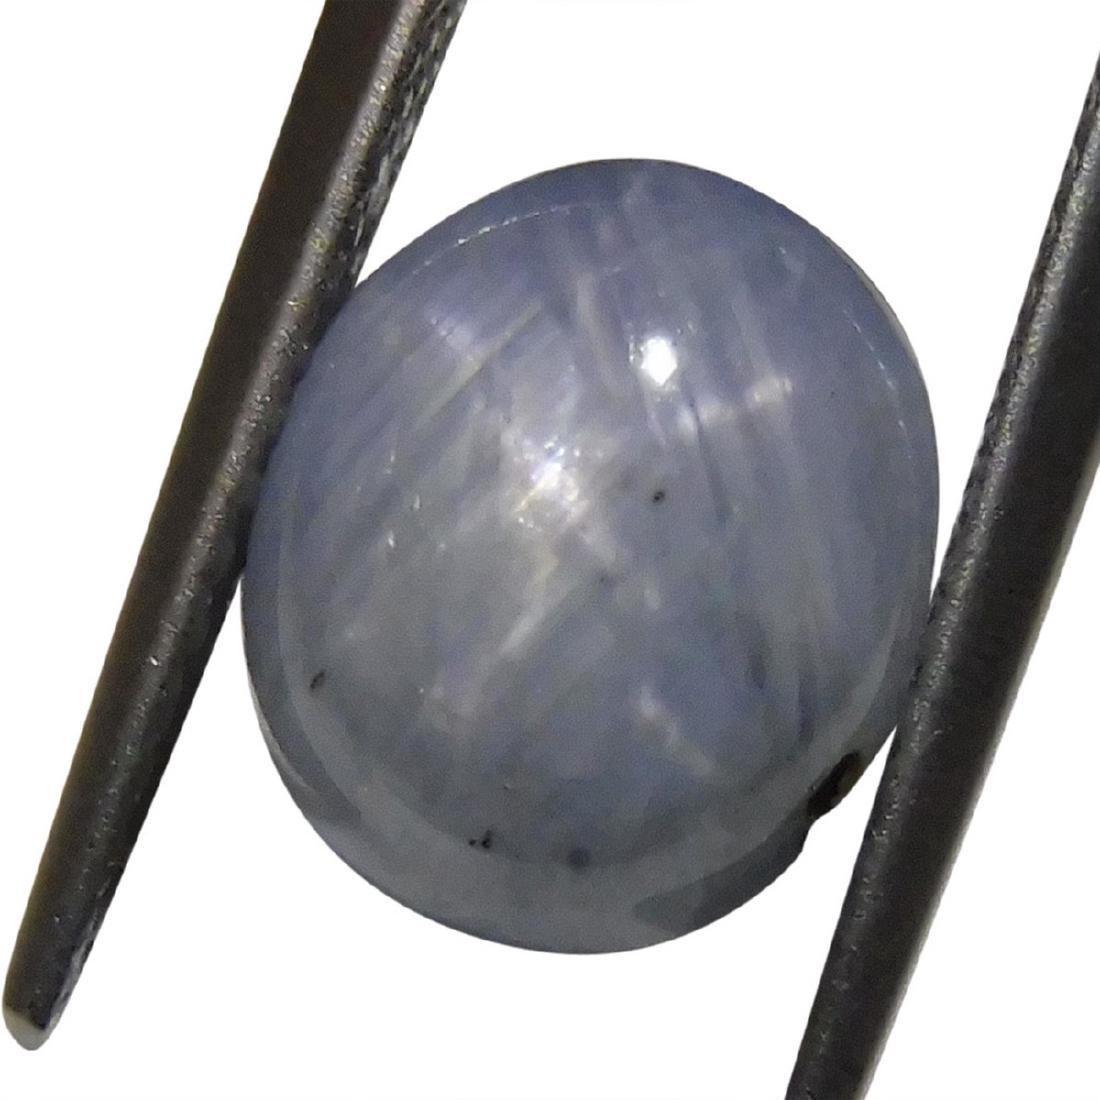 4.05 Carat Loose Oval Star Sapphire - 7